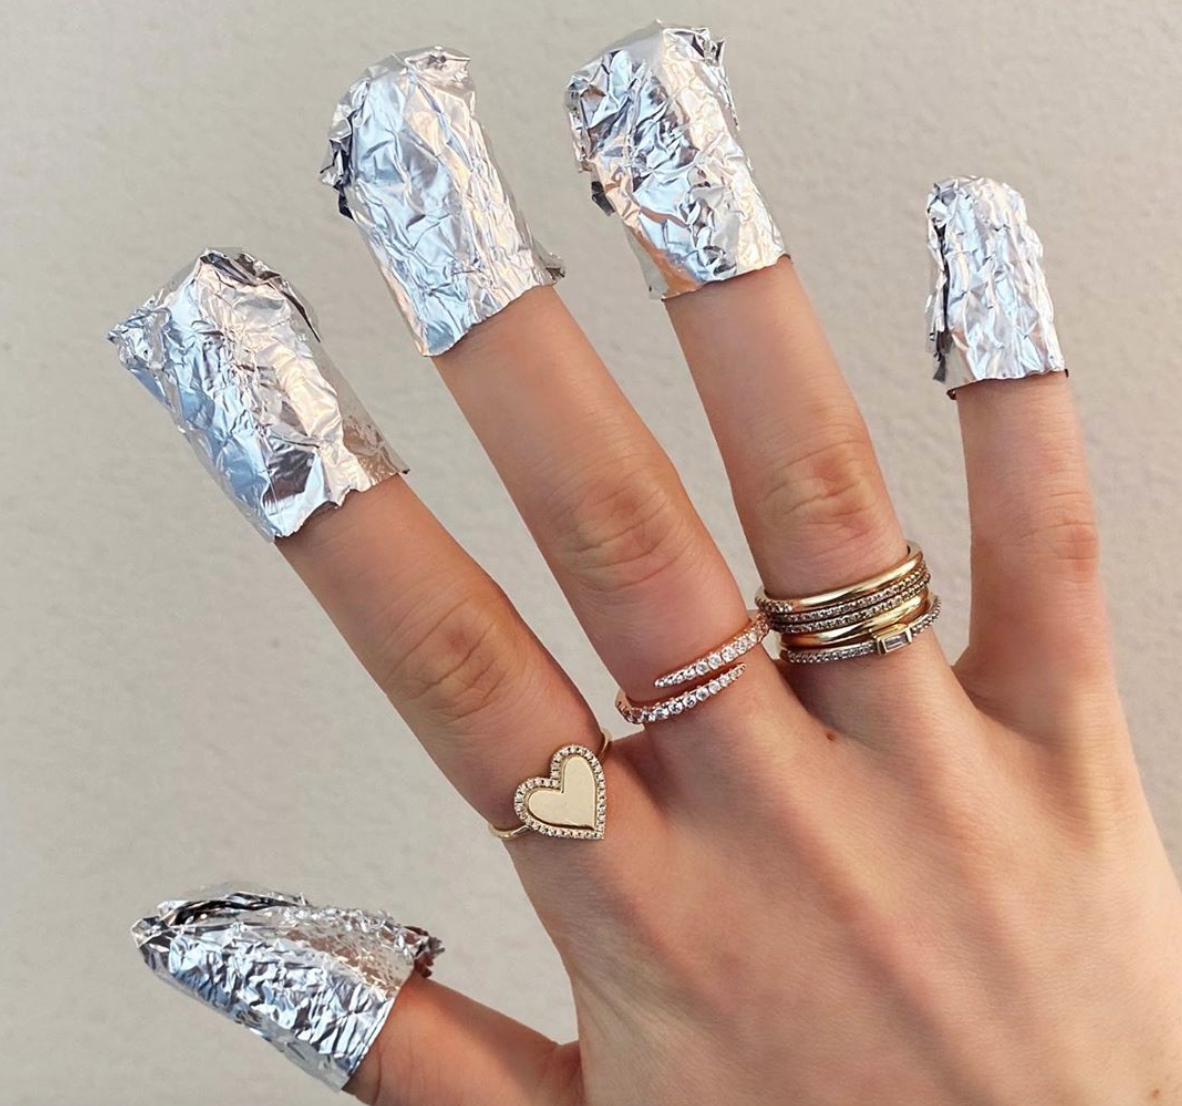 Pin on Remove gel fingernails